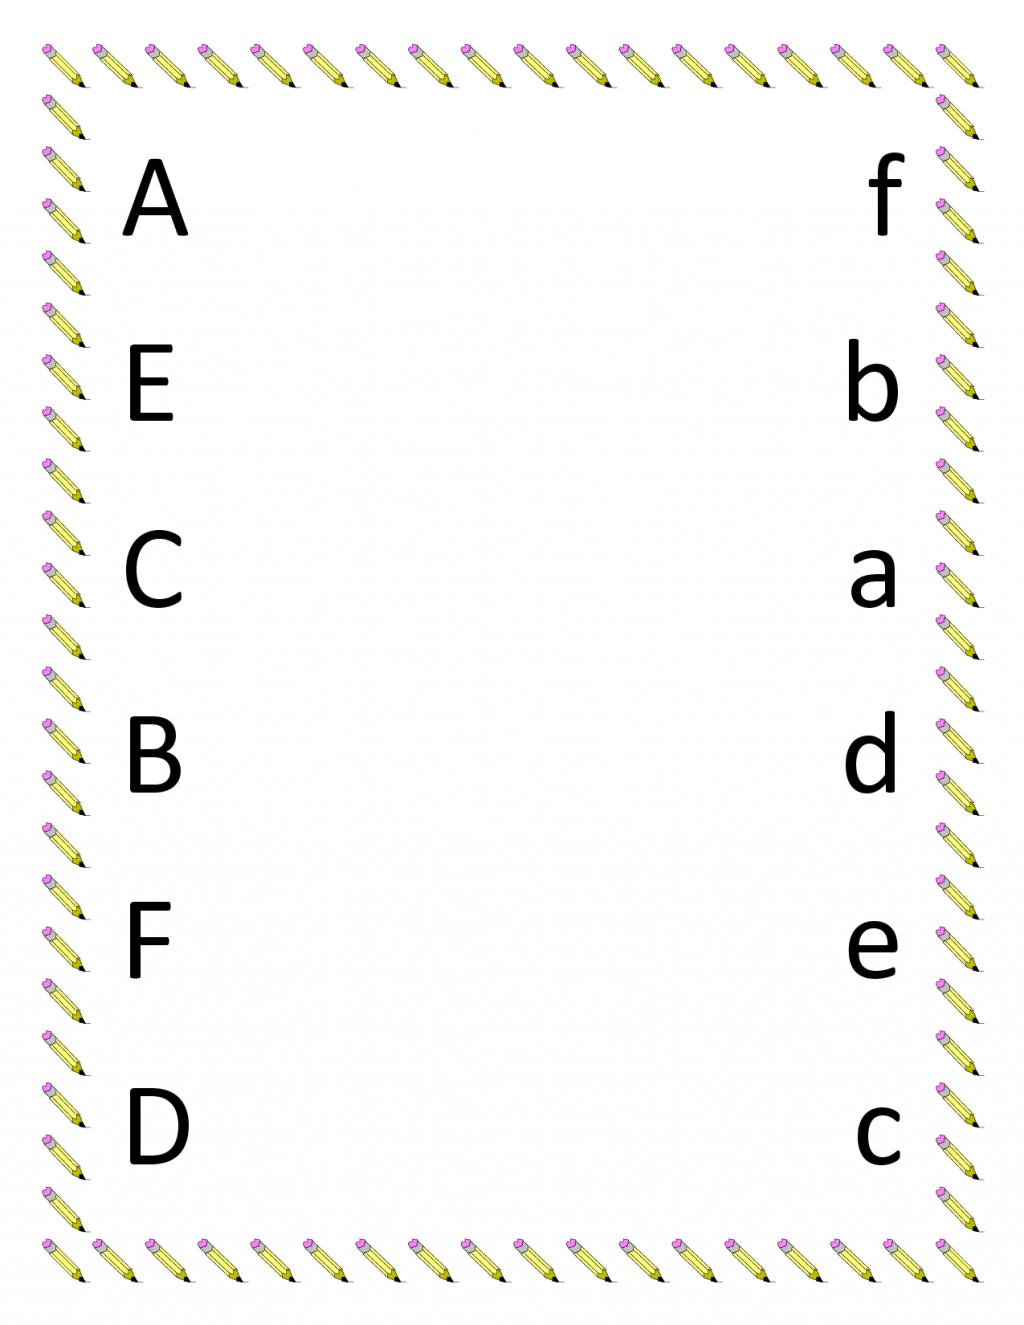 Matching Worksheet For Kindergarten Math Worksheets Free Alphabet